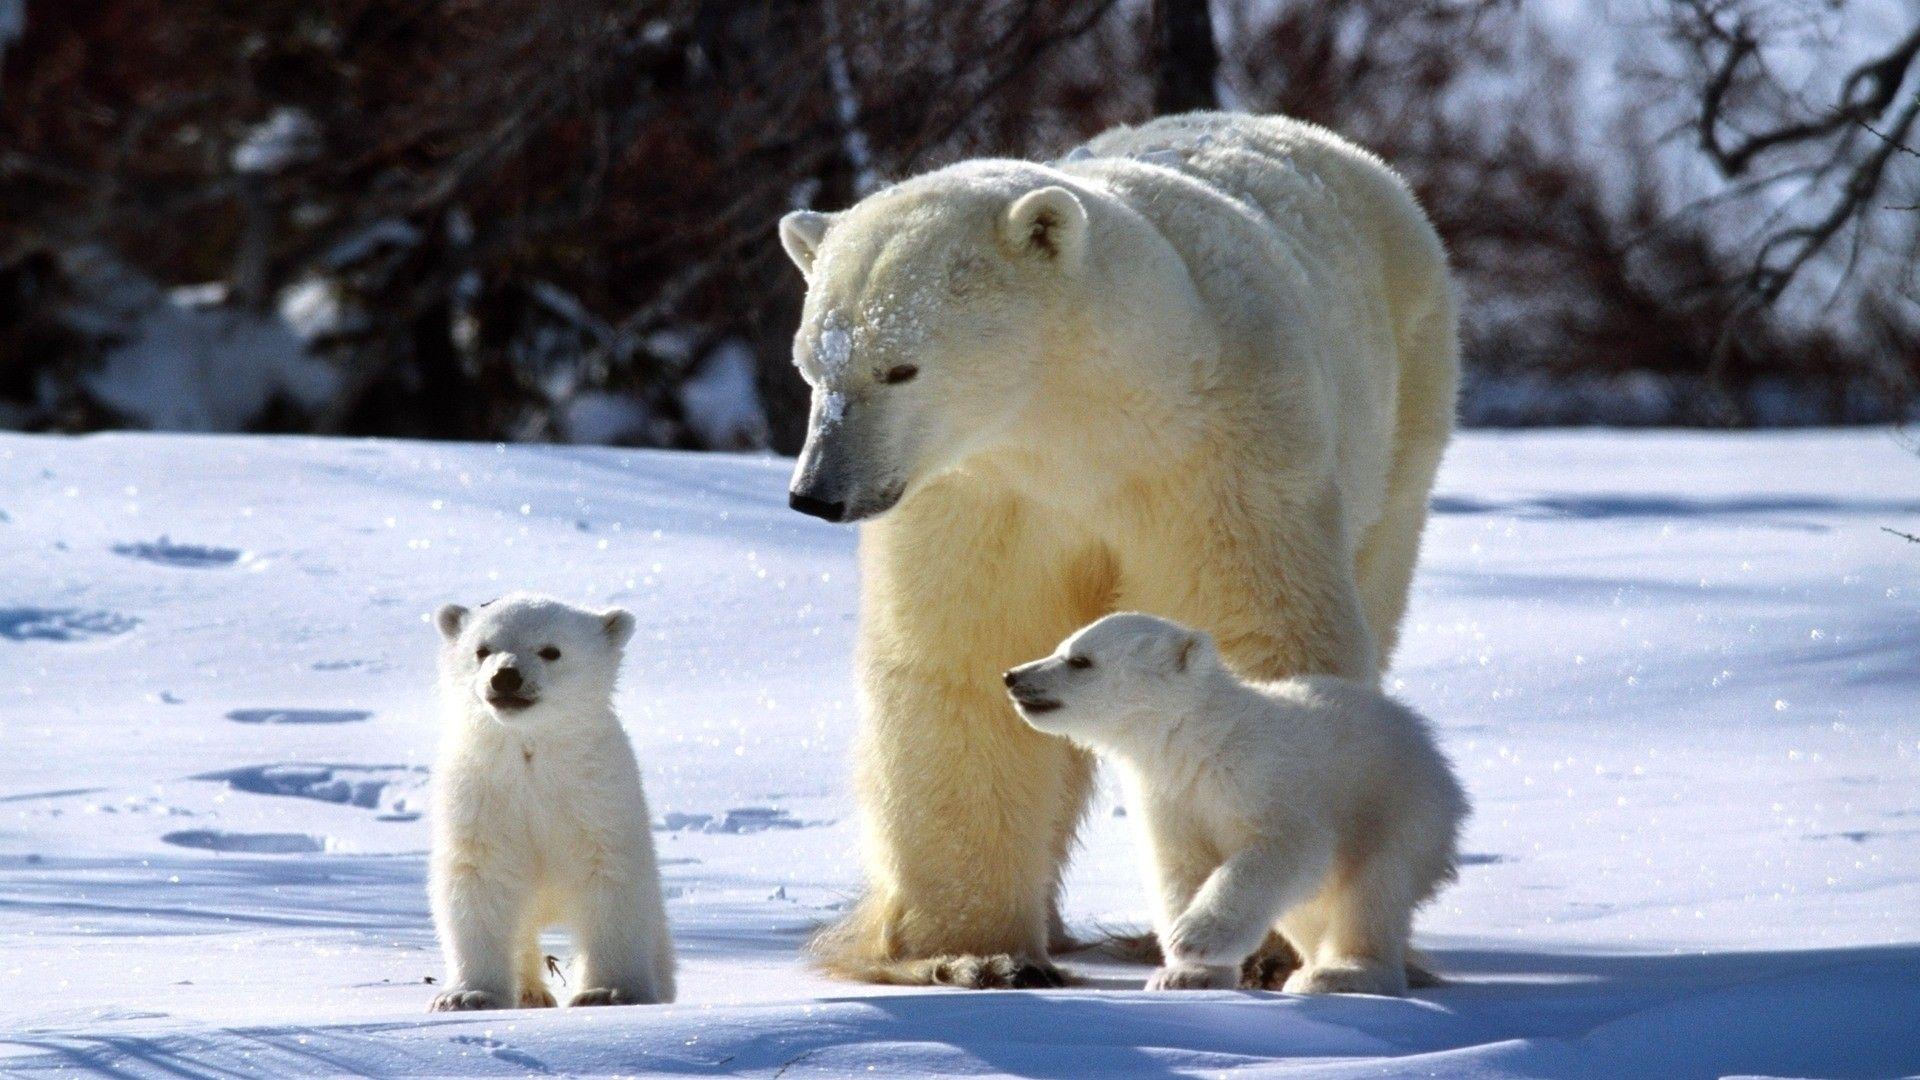 1920x1080 Wallpaper Polar Bears Snow Family Walk Baby Polar Bears Polar Bear Cute Polar Bear